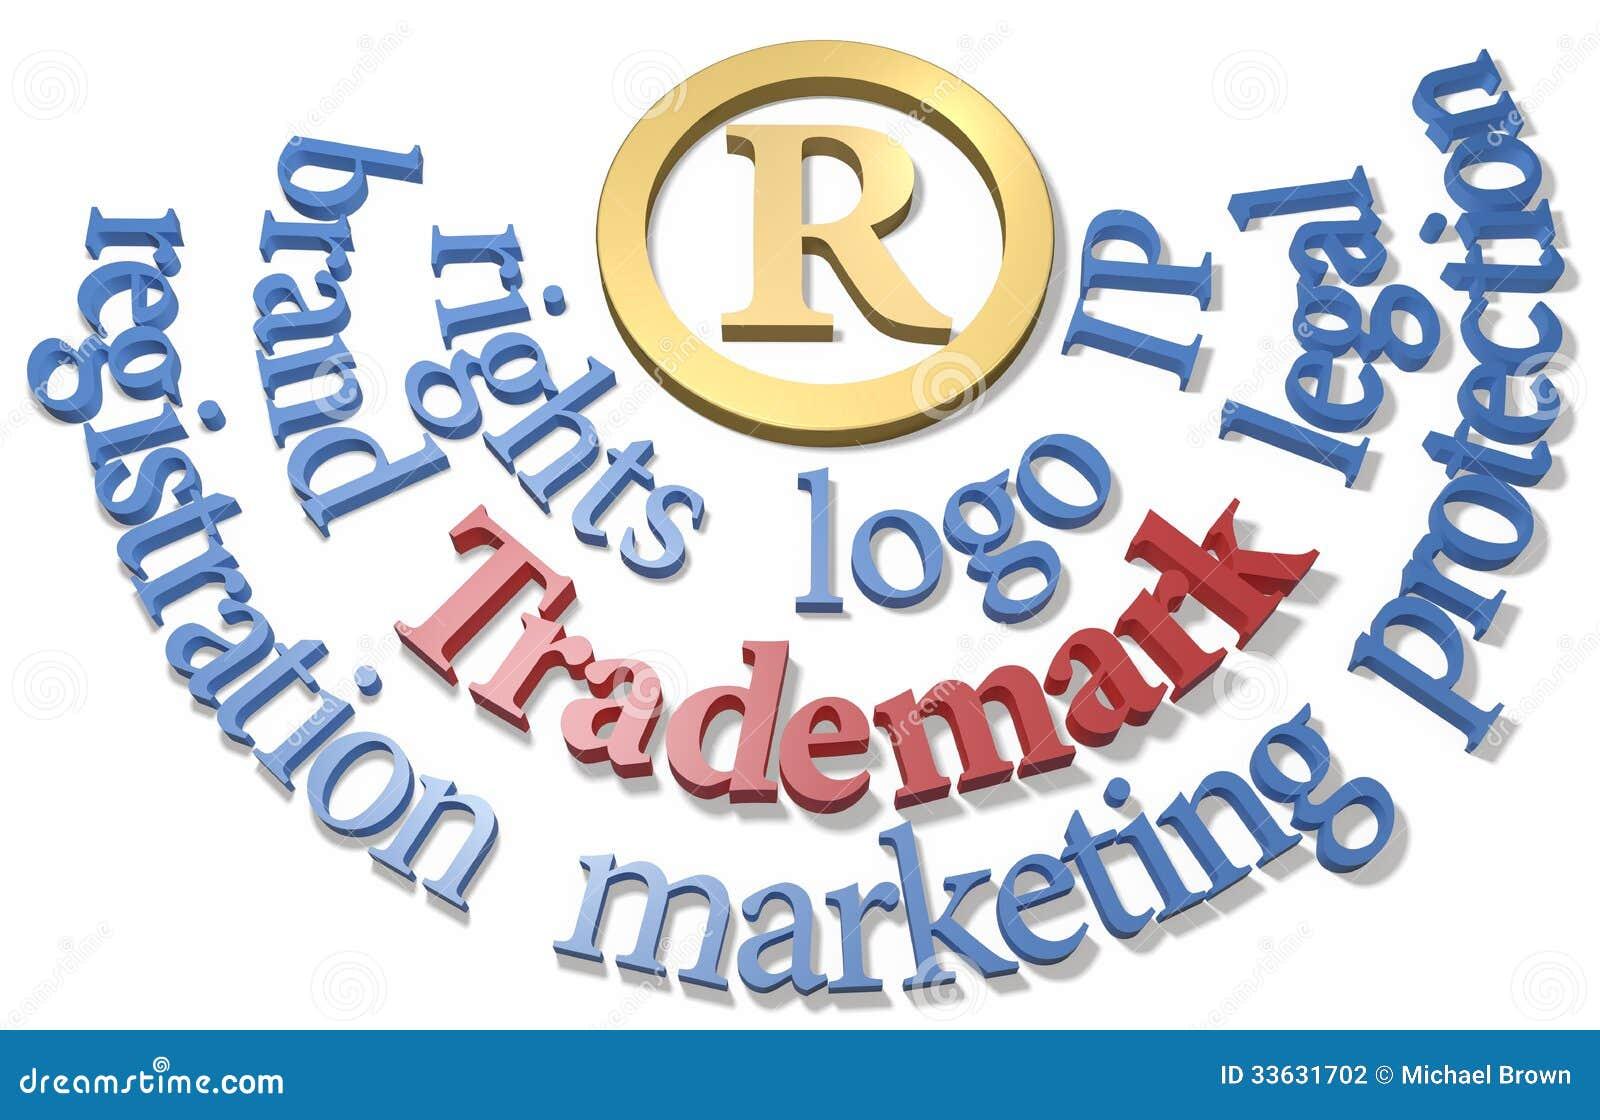 Trademark words around ip r symbol stock illustration trademark words around ip r symbol biocorpaavc